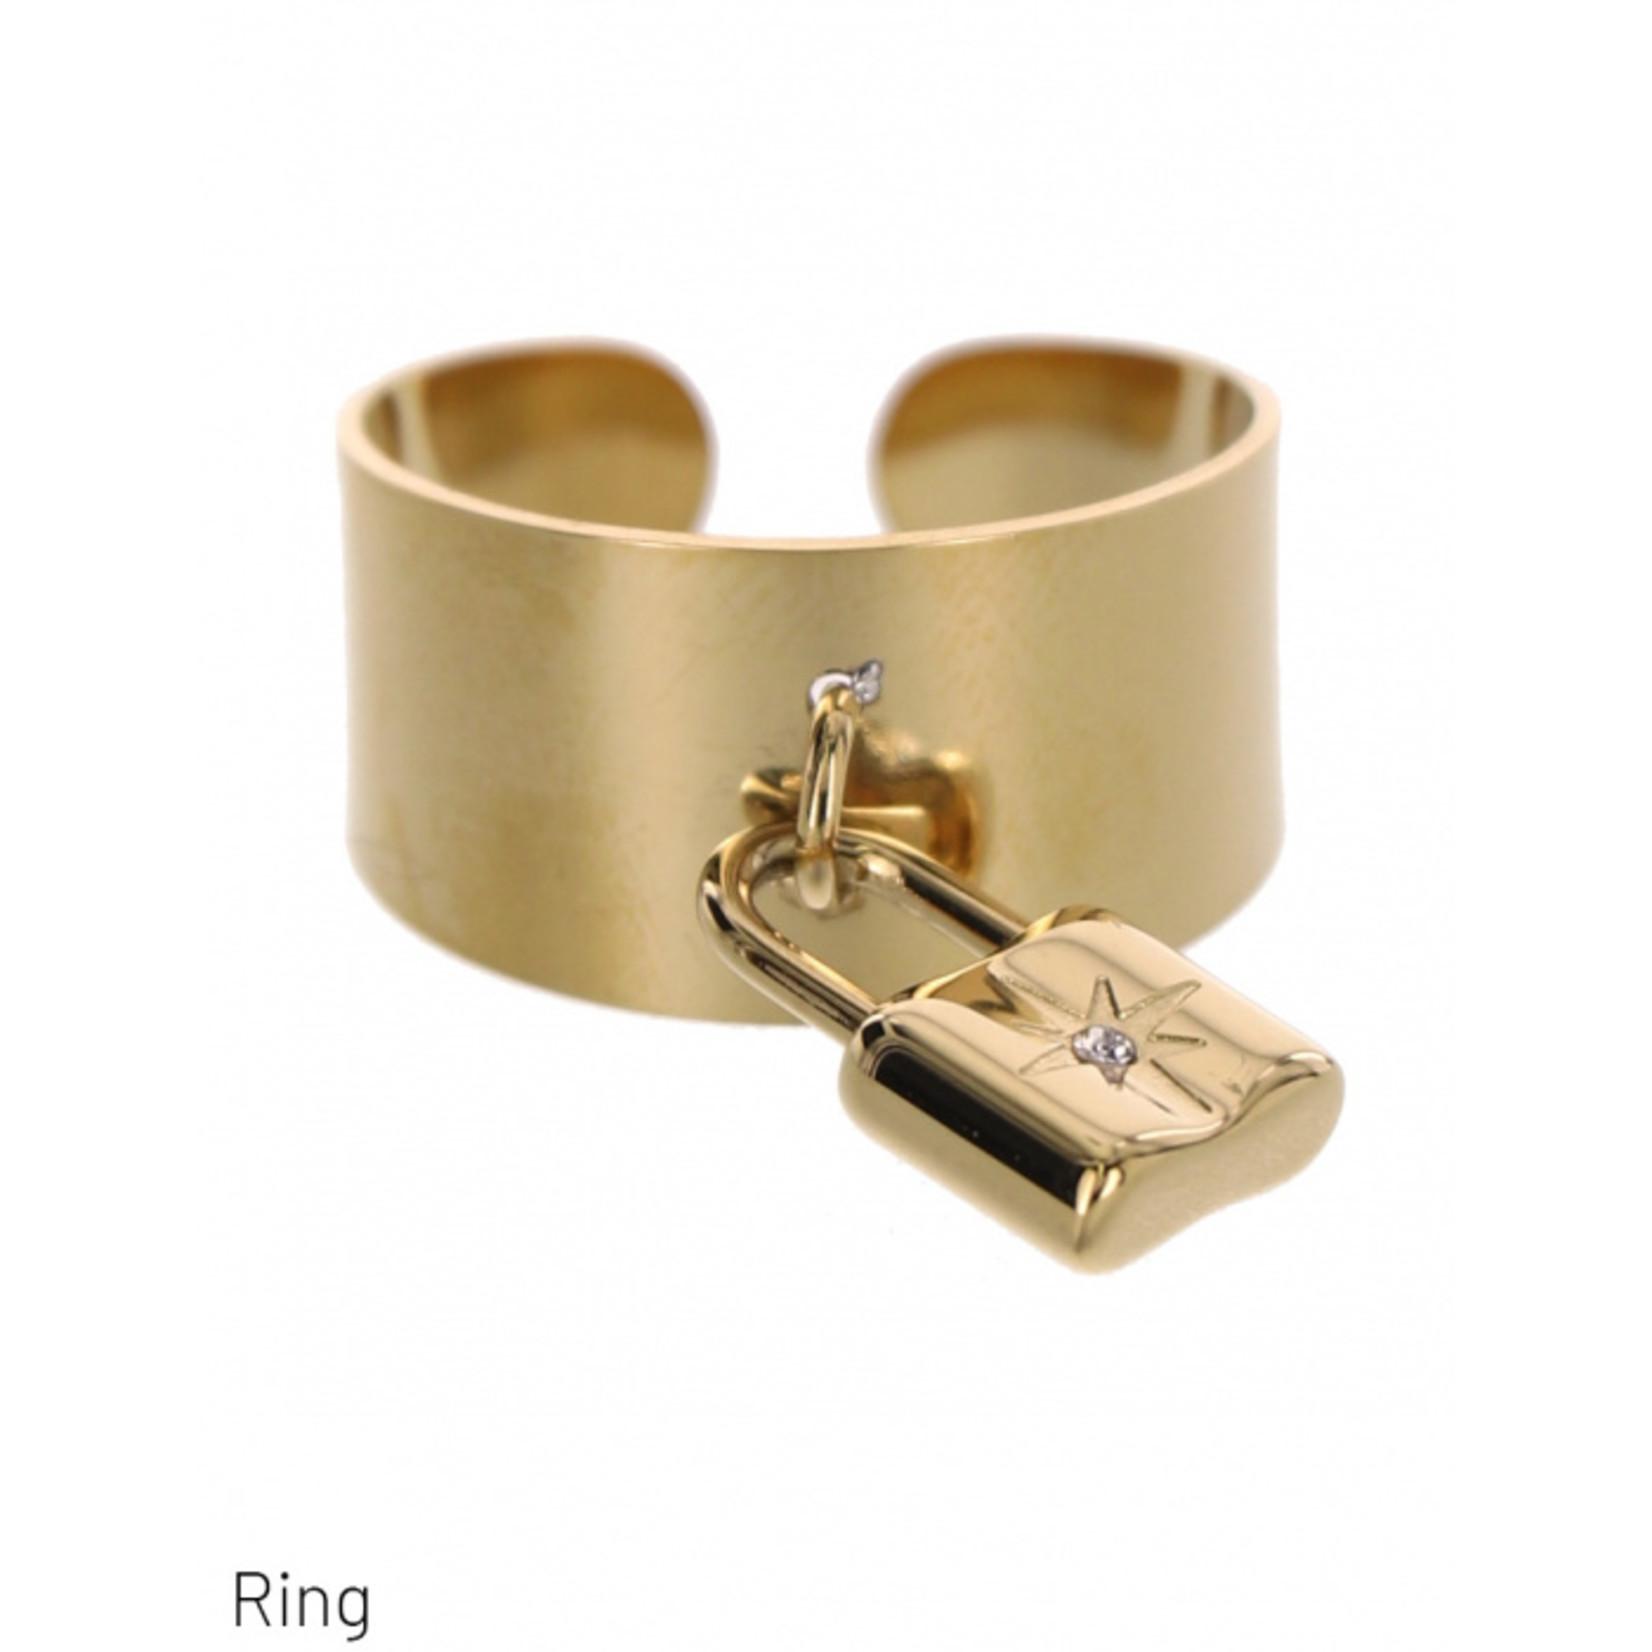 Dodi Ring goudkleurig verstelbaar met hangend slot